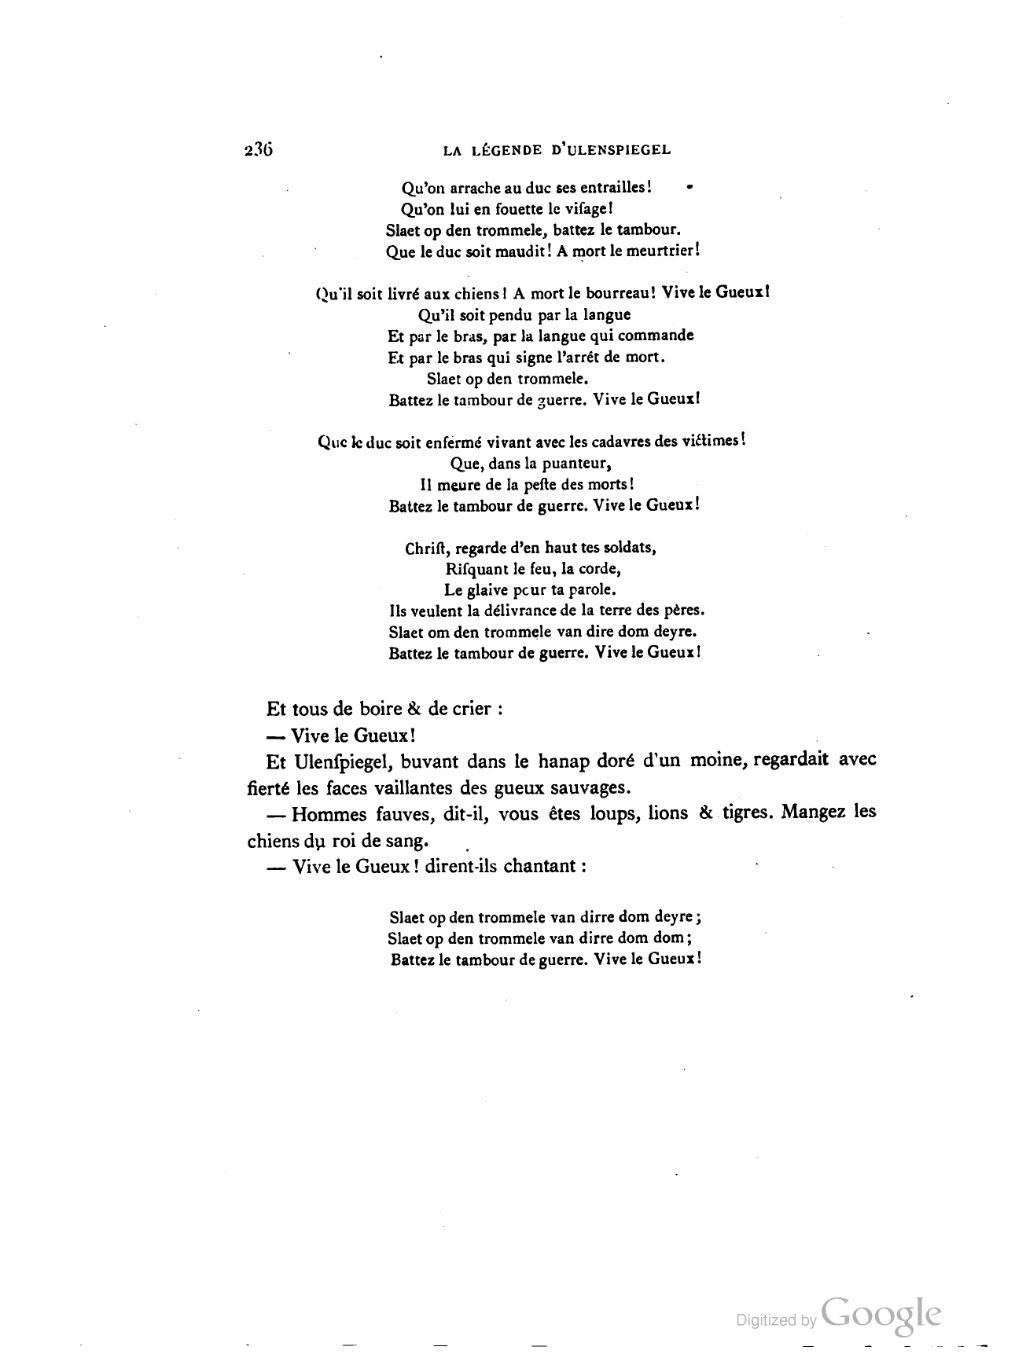 Pagede Coster La Légende Dulenspiegel 1869djvu284 Wikisource